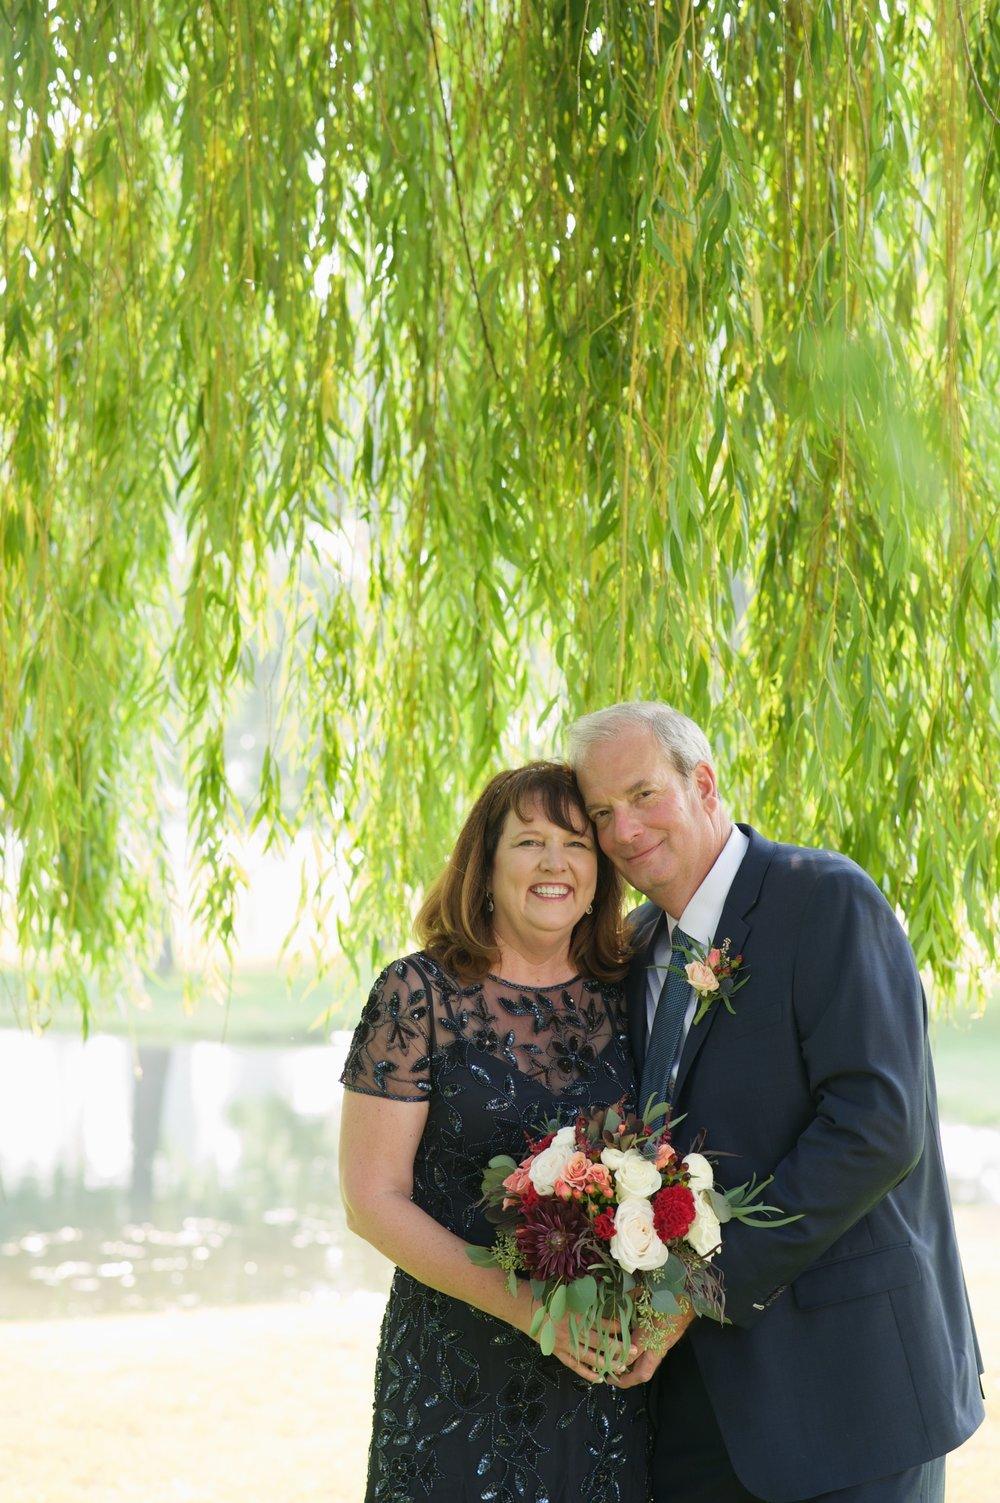 lindseyjane_wedding066.jpg